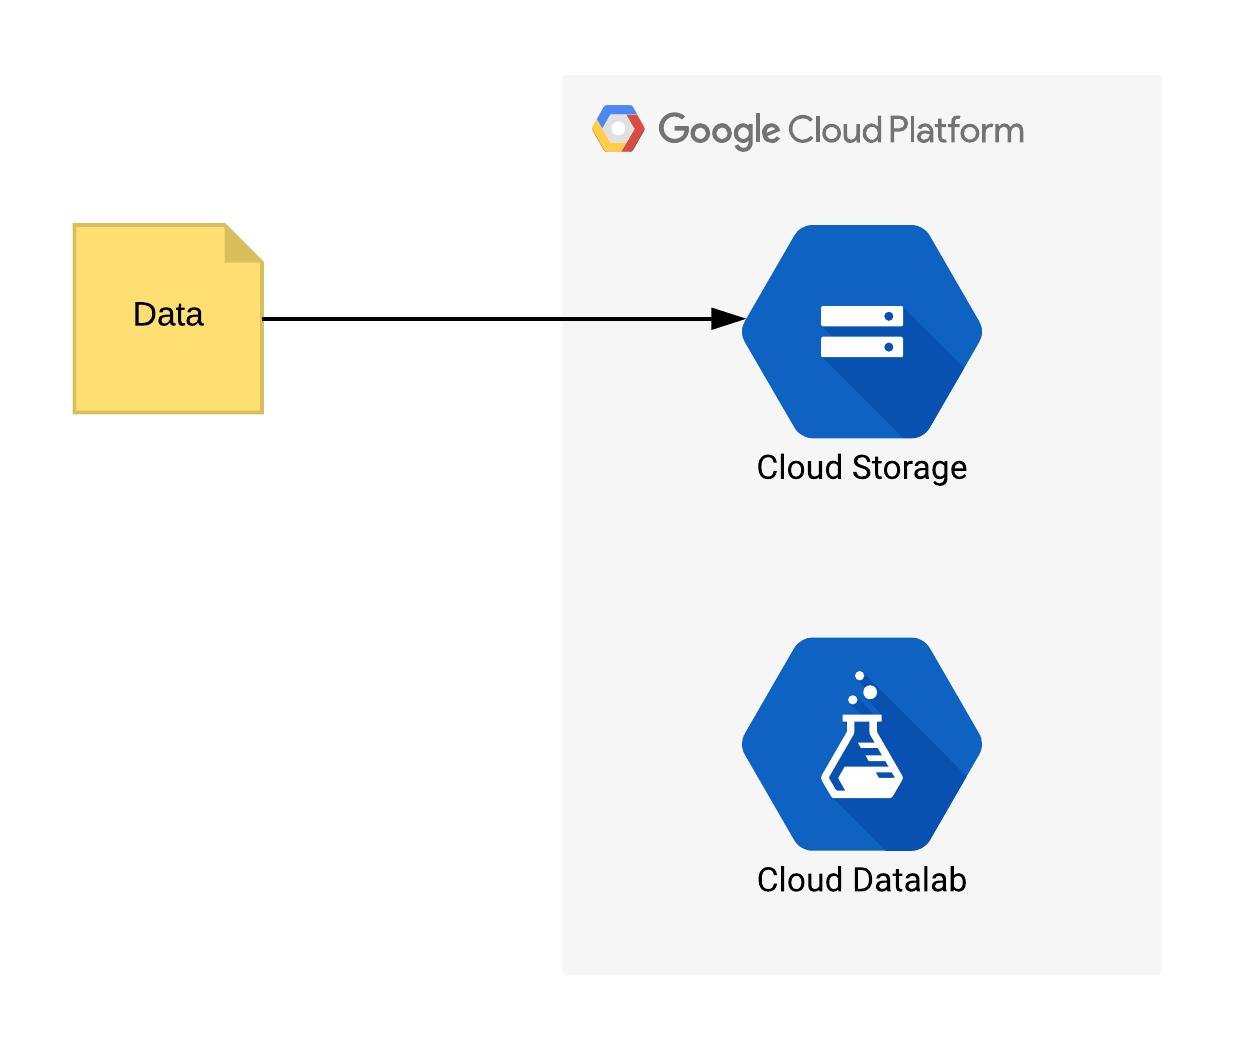 An Overview of Google Cloud Platform Services